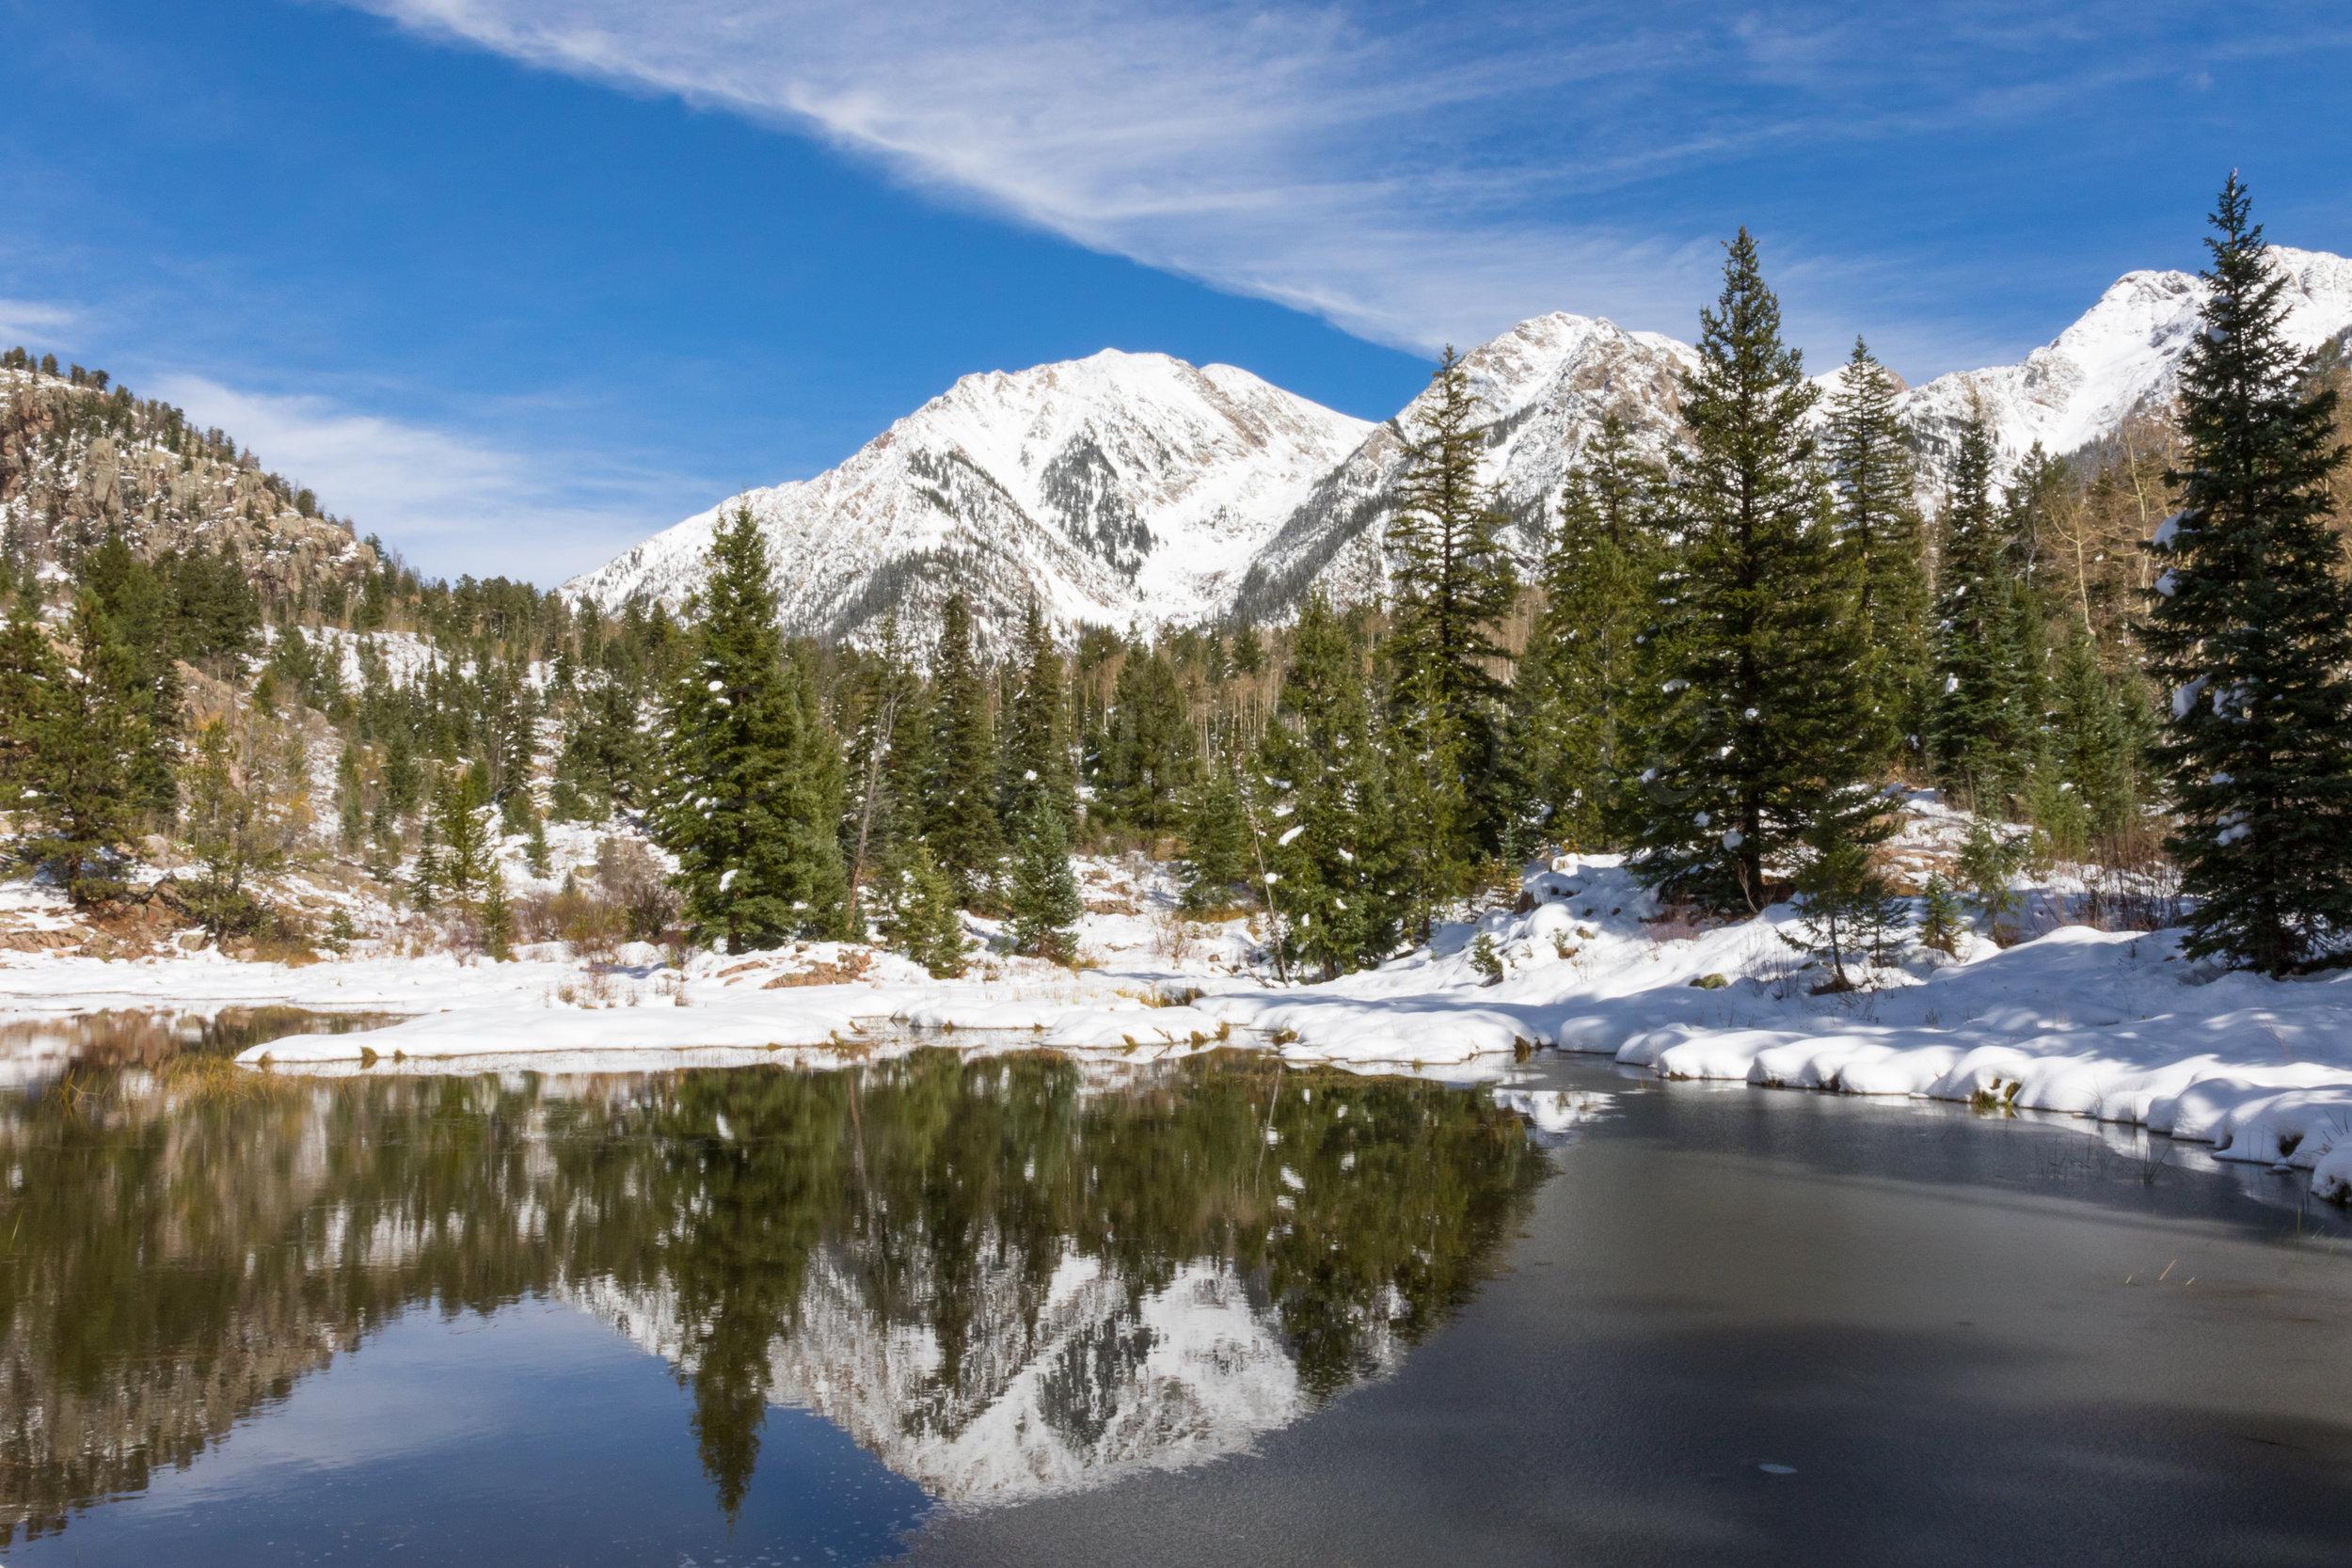 Spud Lake, Image # 0716